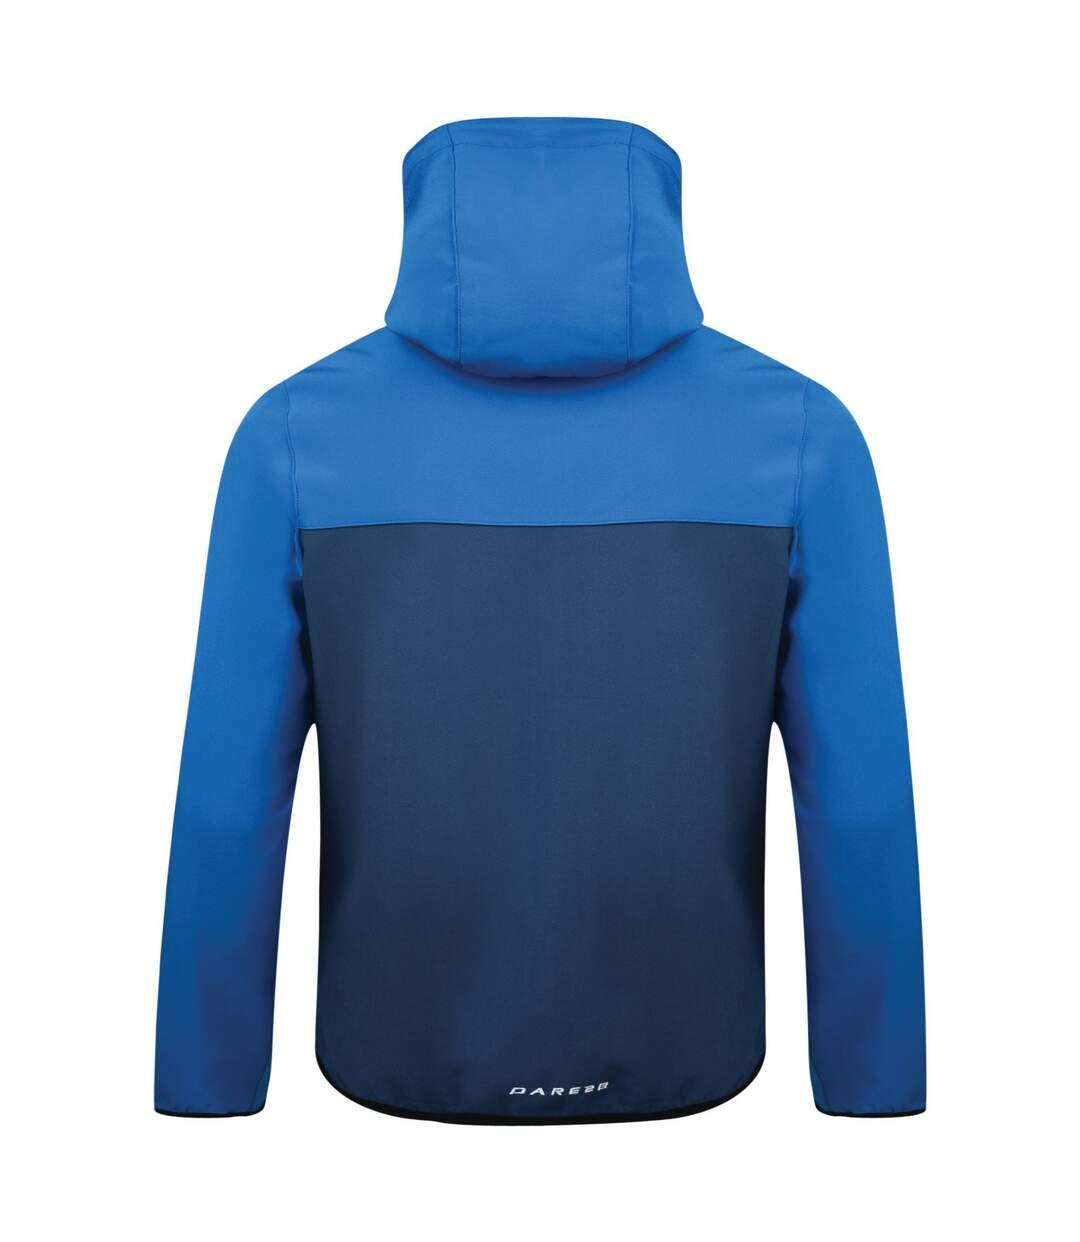 Dare 2b Mens Devise Softshell Jacket (Admiral Blue/Oxford Blue) - UTRG2994